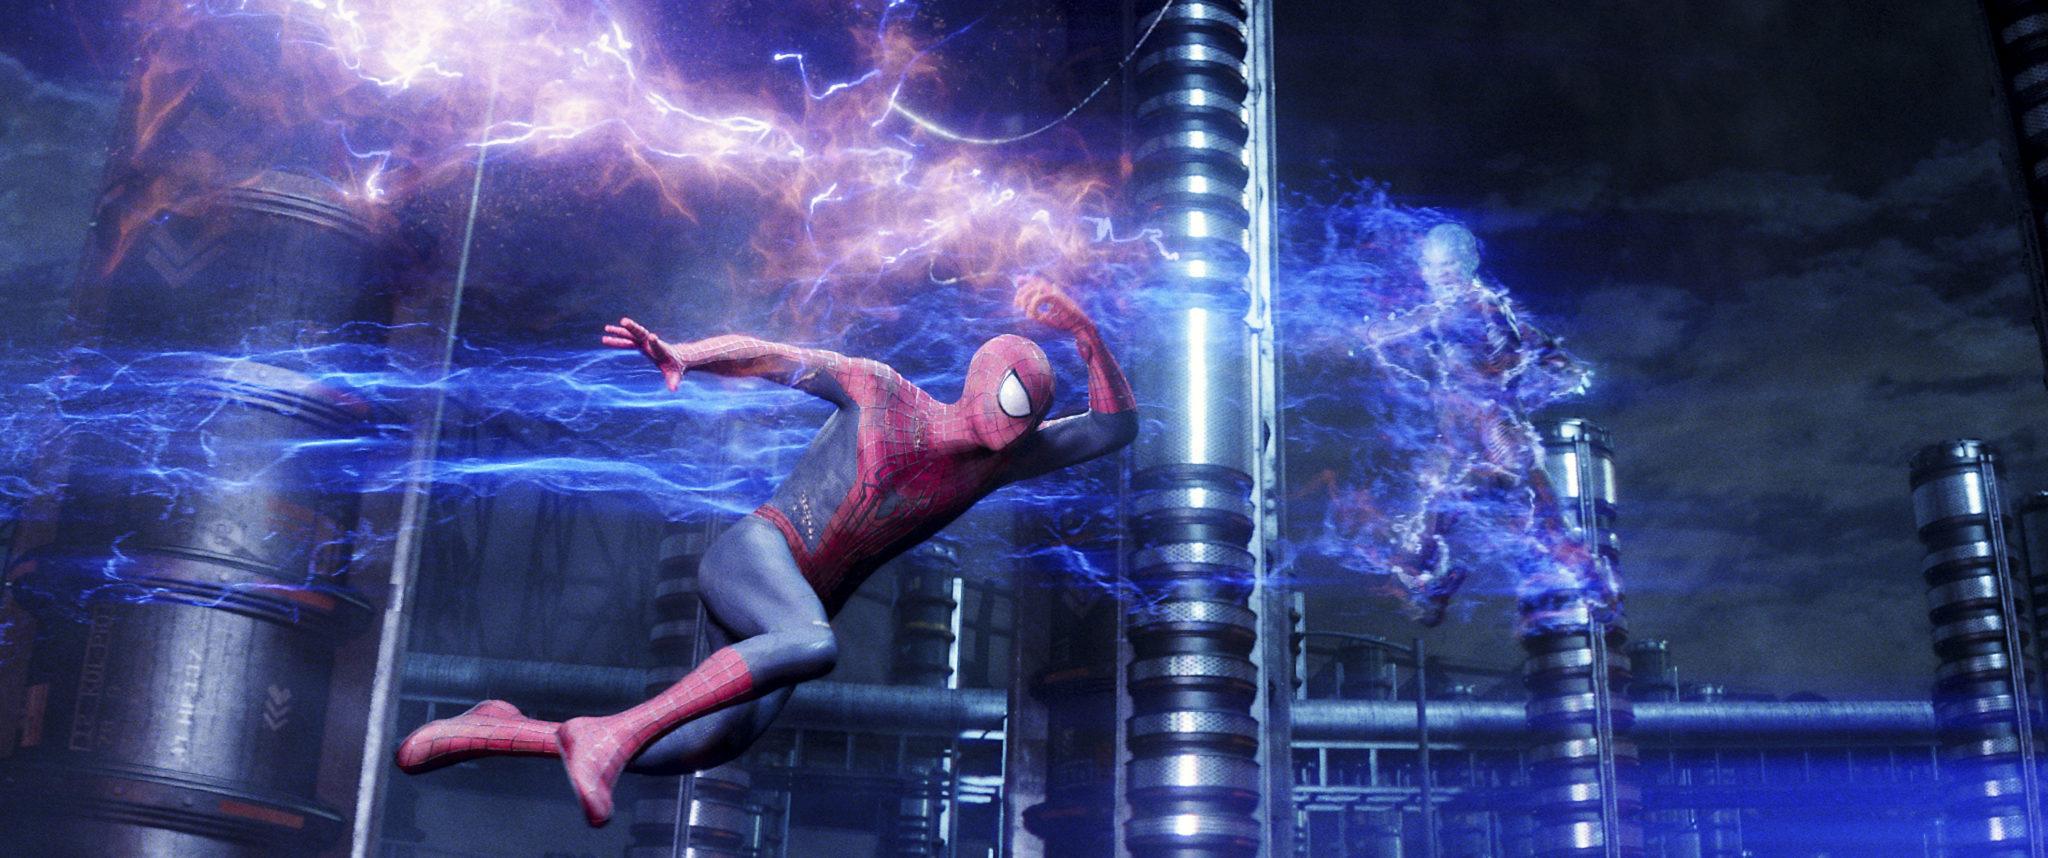 906429 – The Amazing Spider-Man 2